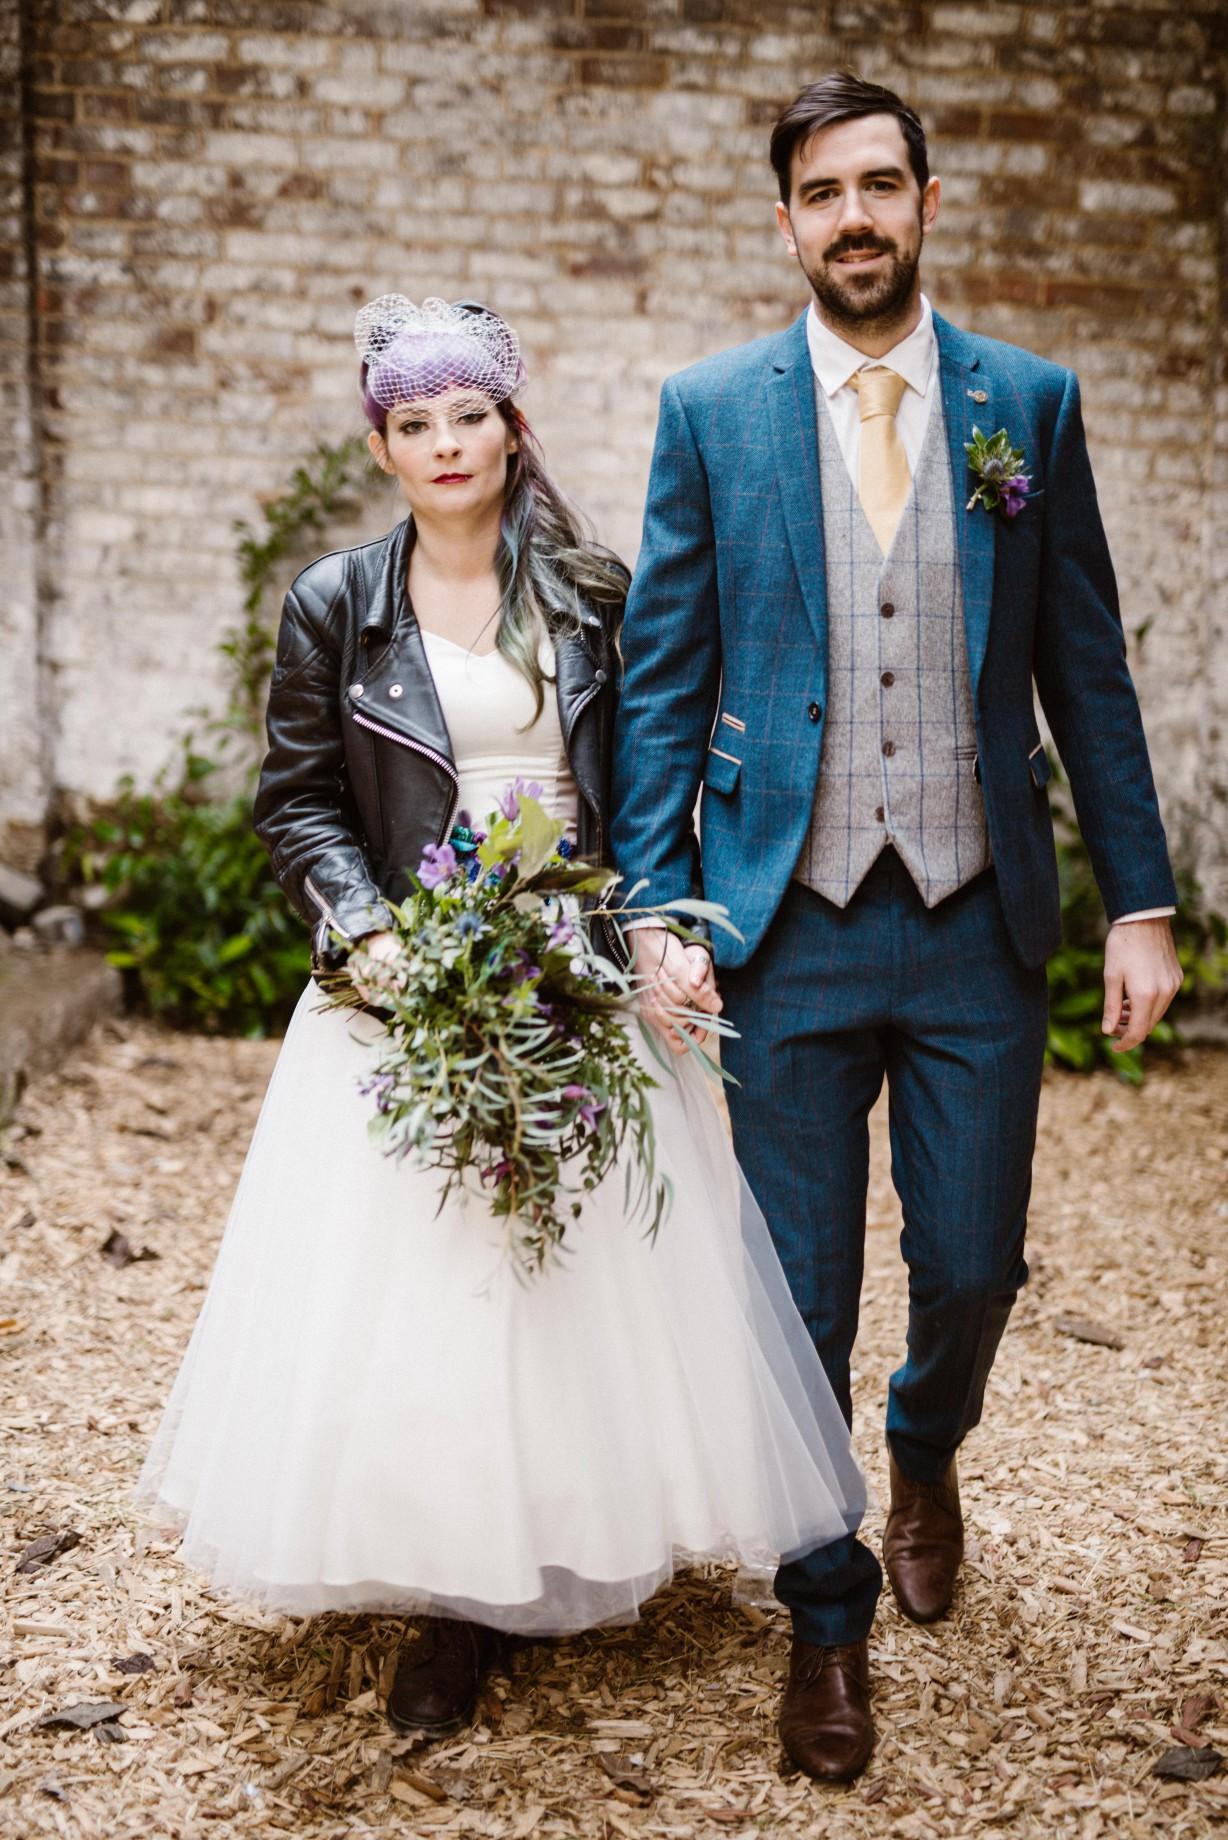 Peacock barns - alternative unconventional wedding photoshoot - rustic decadent - bridal leather jacket - barn